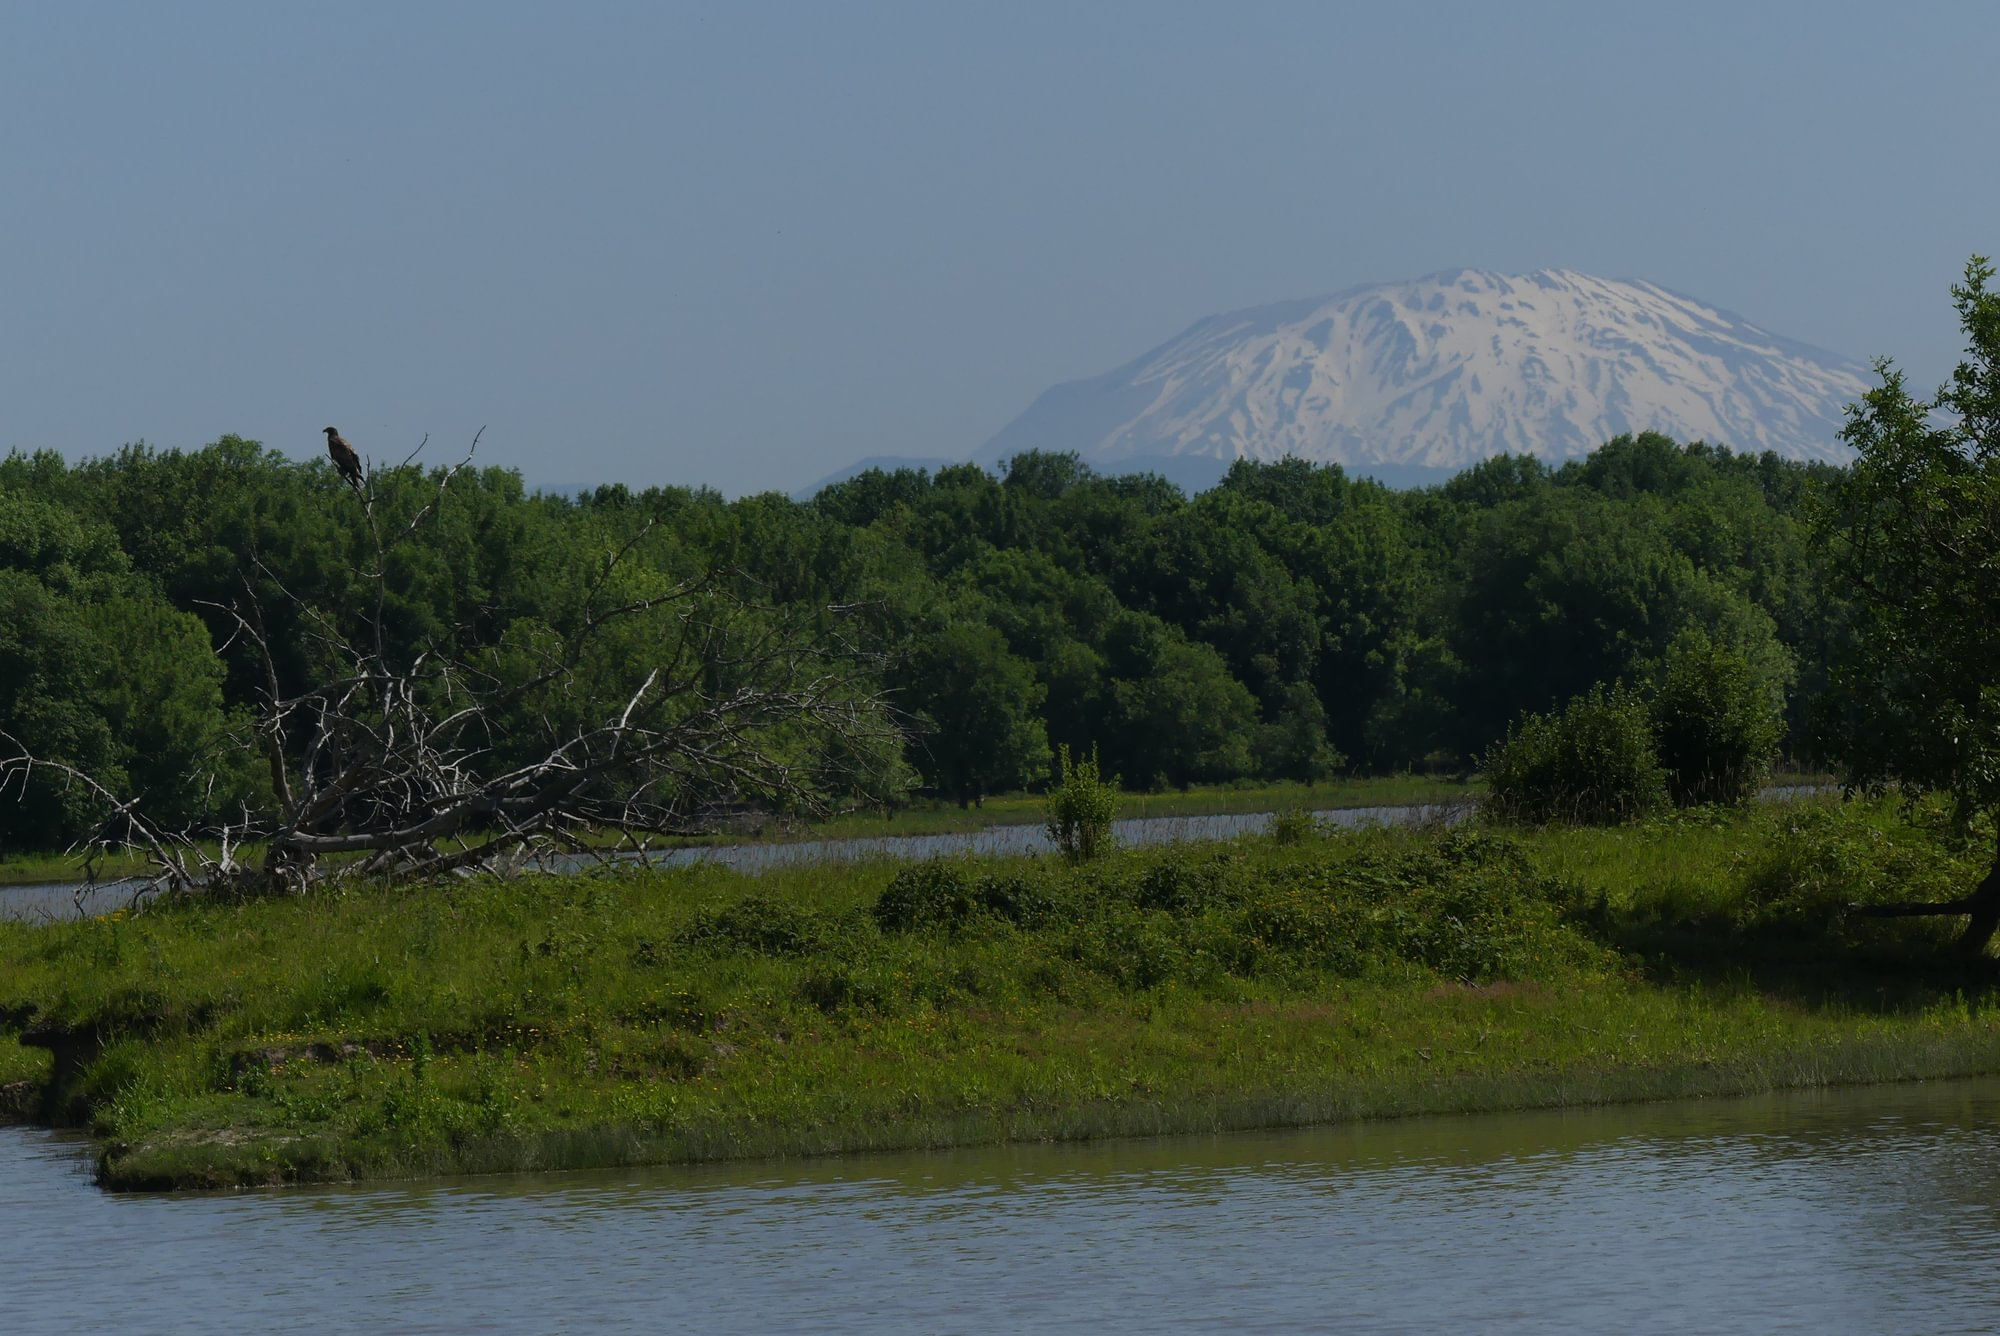 Mud Lake Bald Eagle Mt. St. Helens Sauvie Island Westside Unit Columbia County Oregon